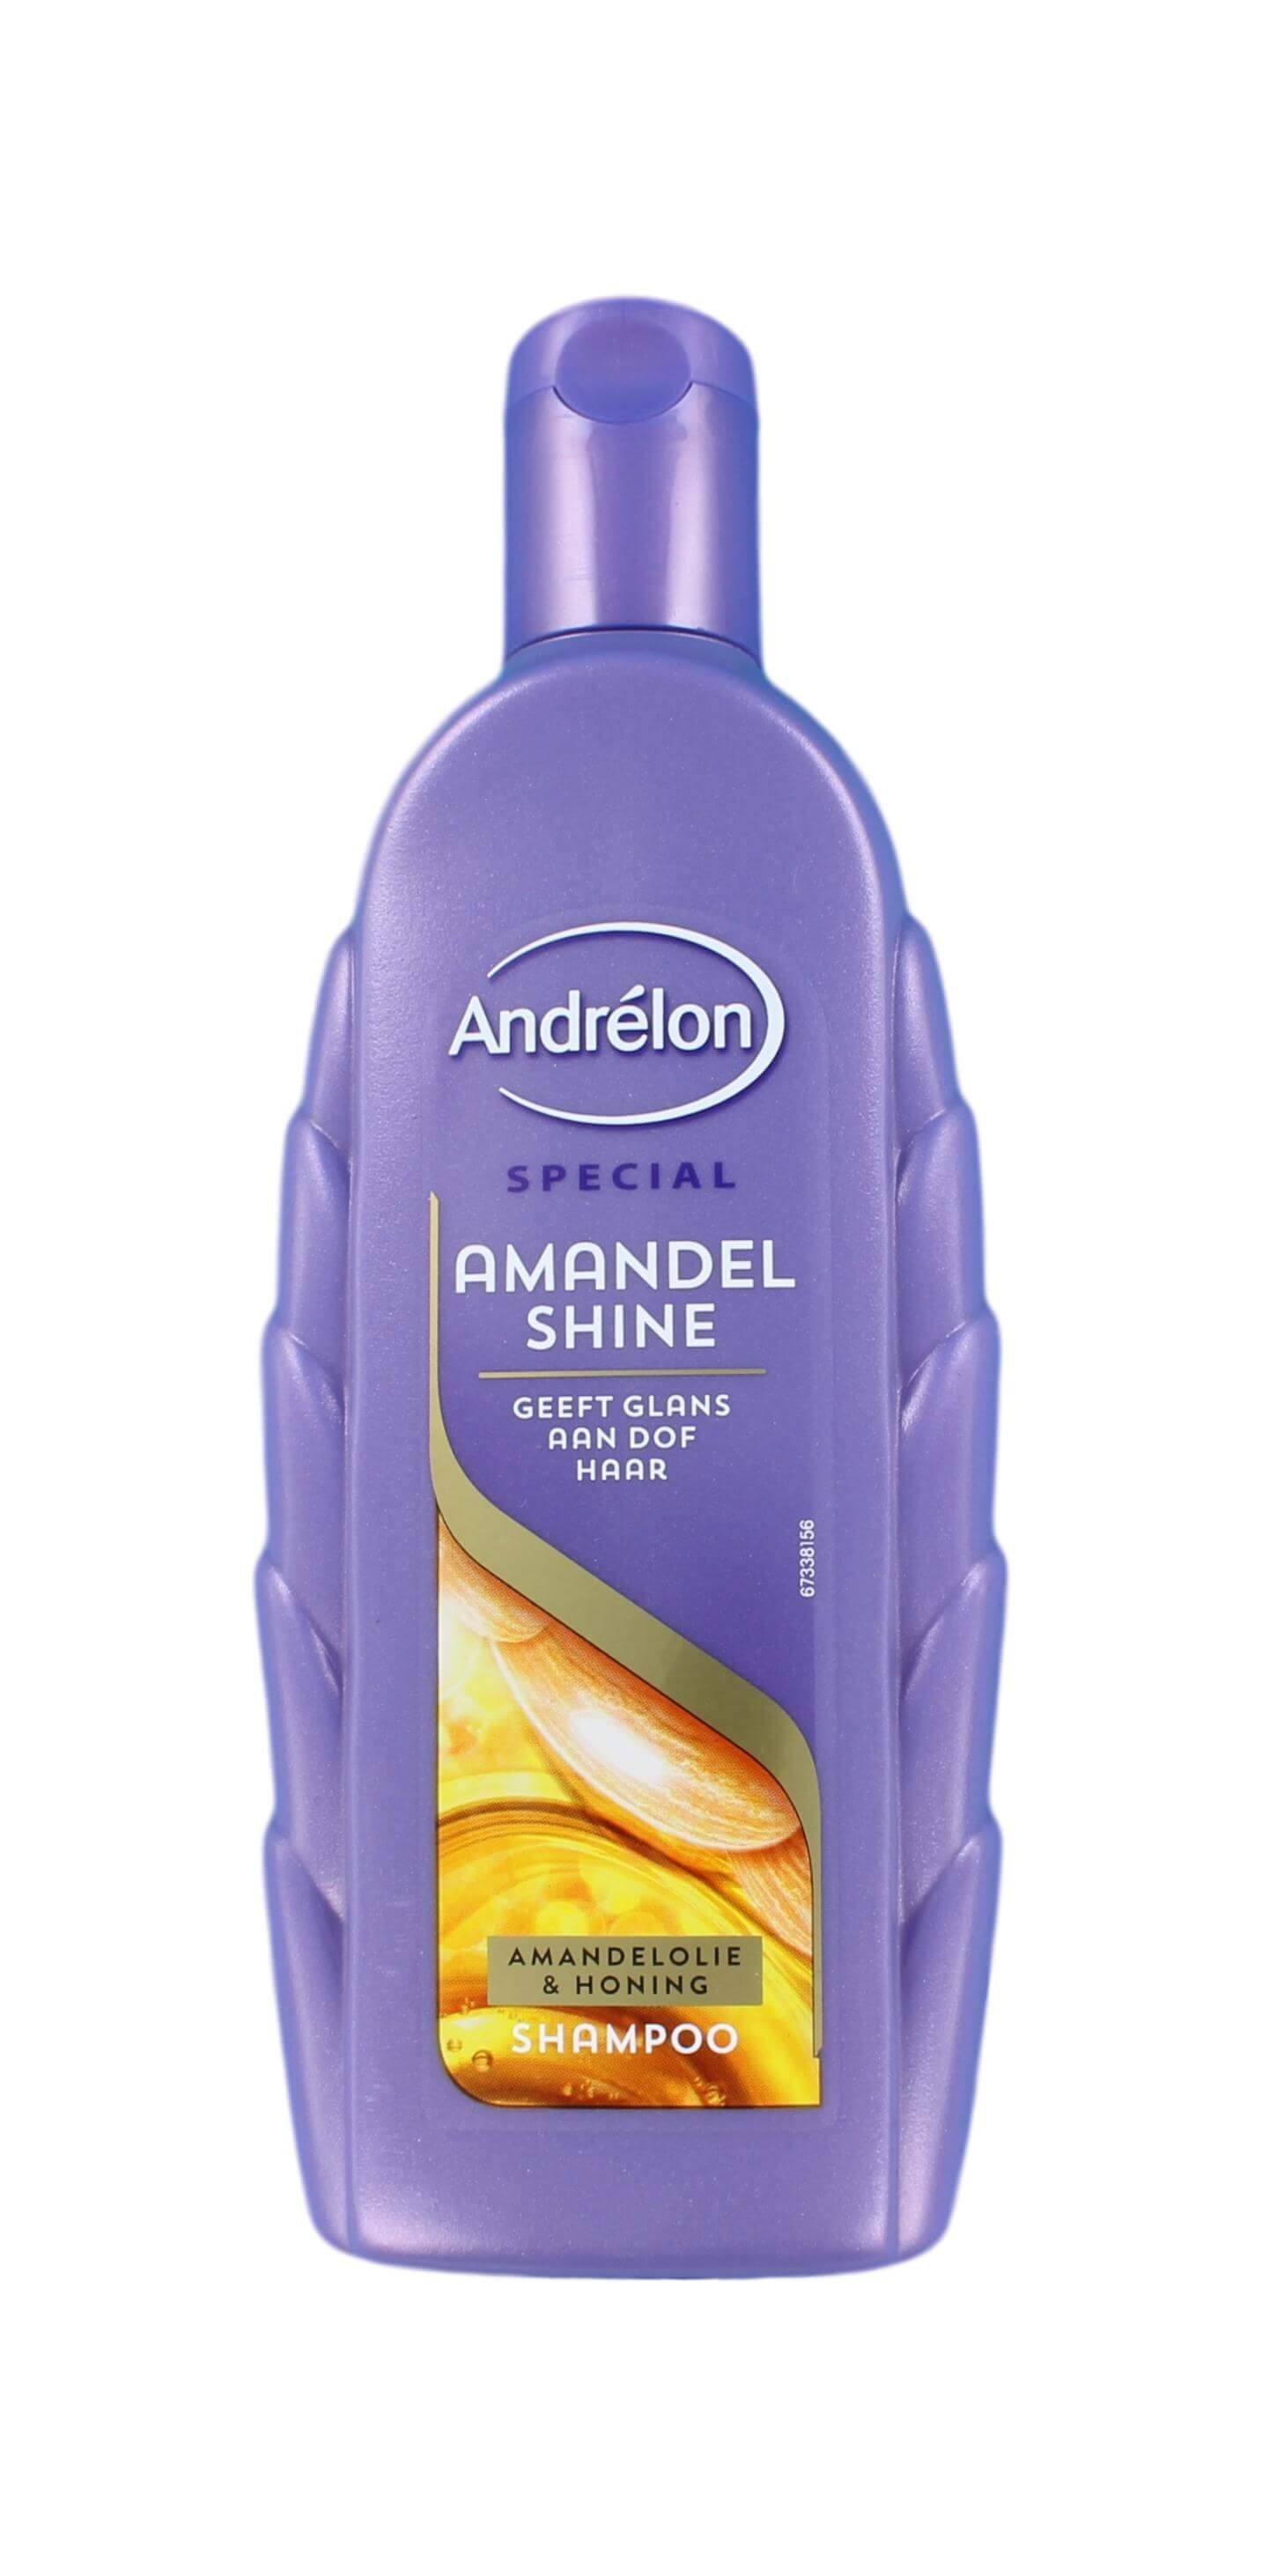 Andrelon Shampoo Amandel Shine bestel je snel en voordelig b